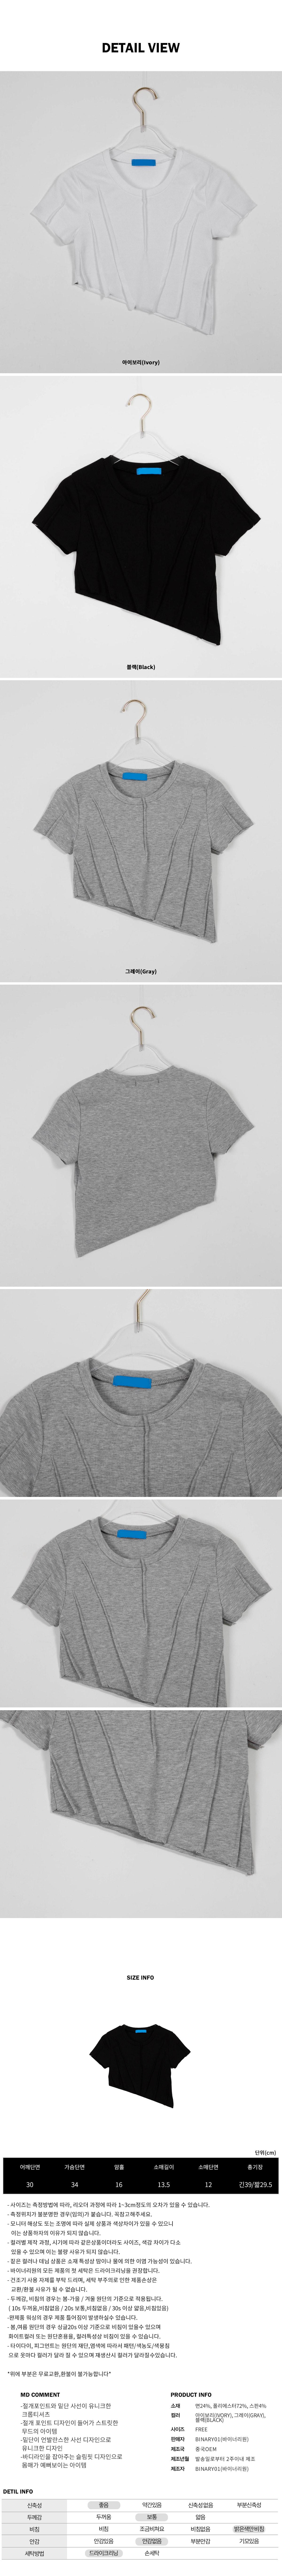 Unbald Creed Crop T-shirt